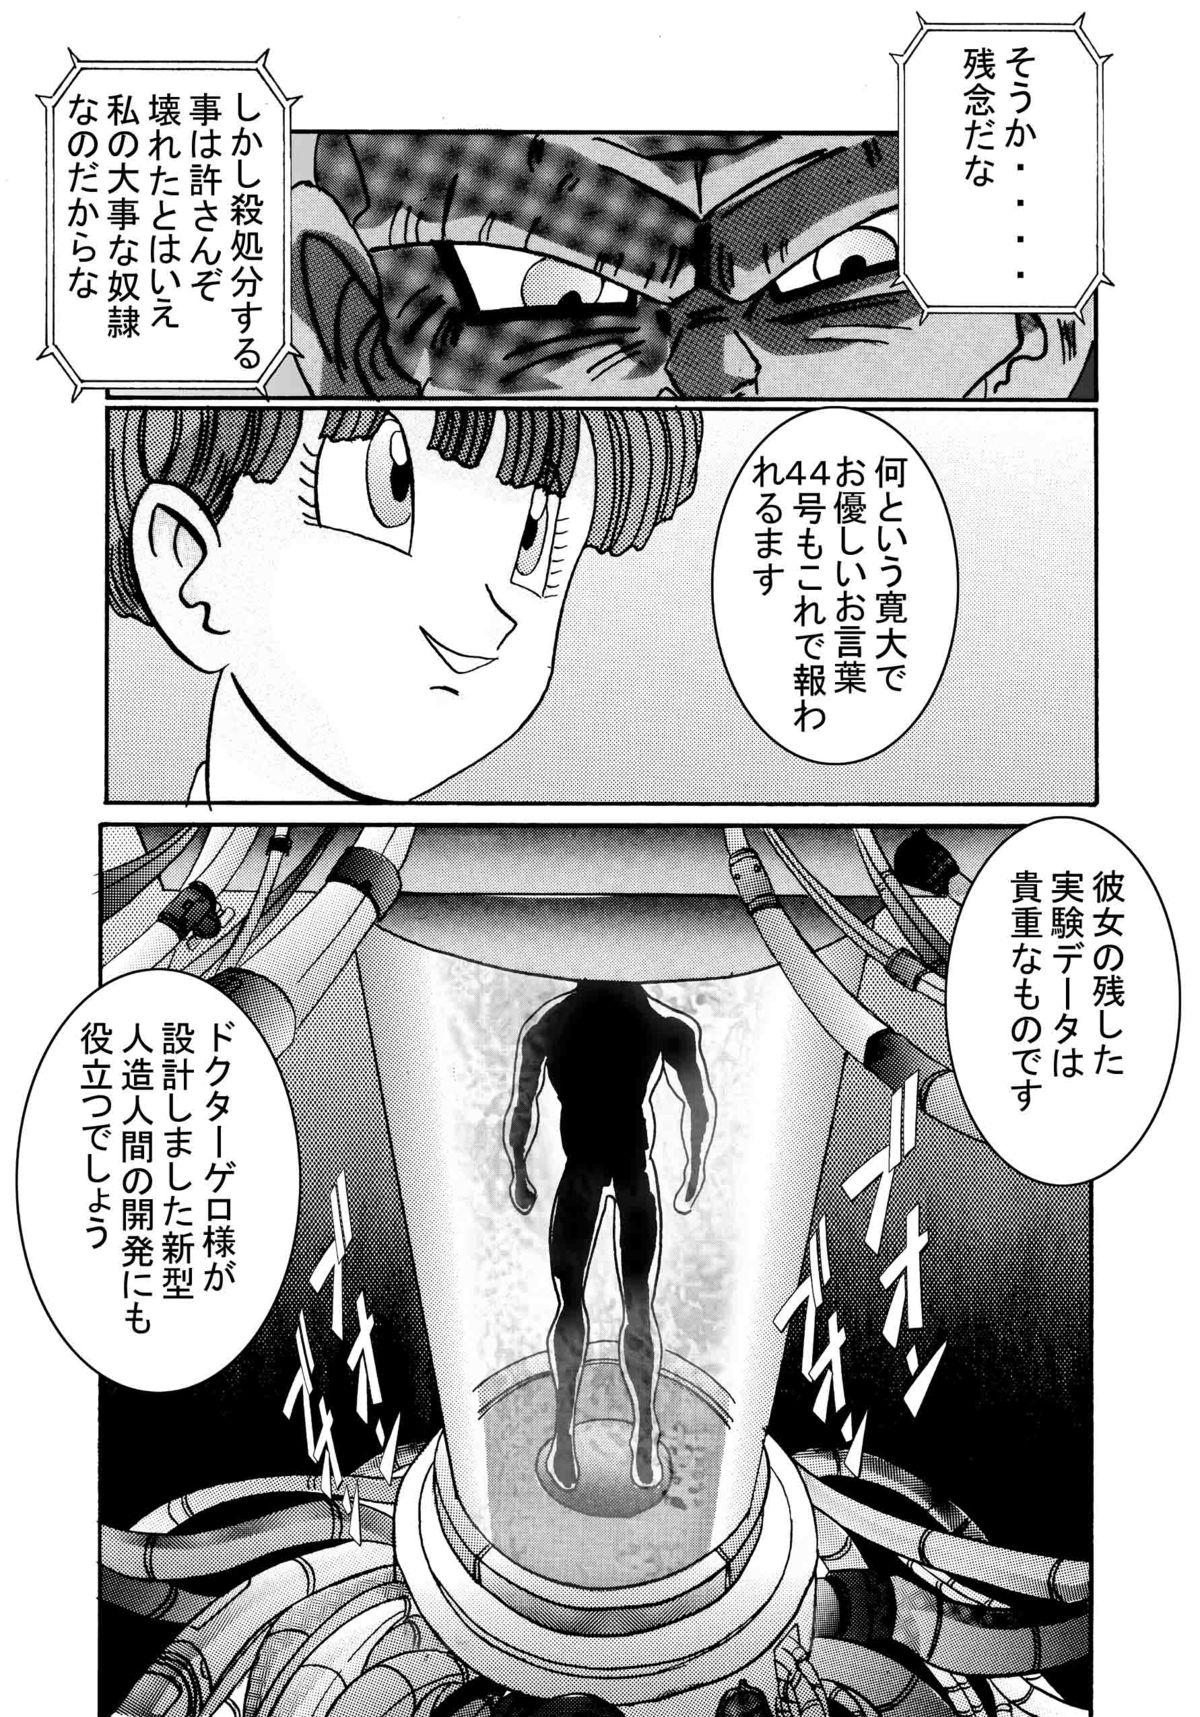 [Light Rate Port Pink] Tanjou!! Aku no Onna Senshi Jinzou Ningen 18-gou Sennou Kaizou Keikaku -Joshou- (Dragon Ball Z) 10